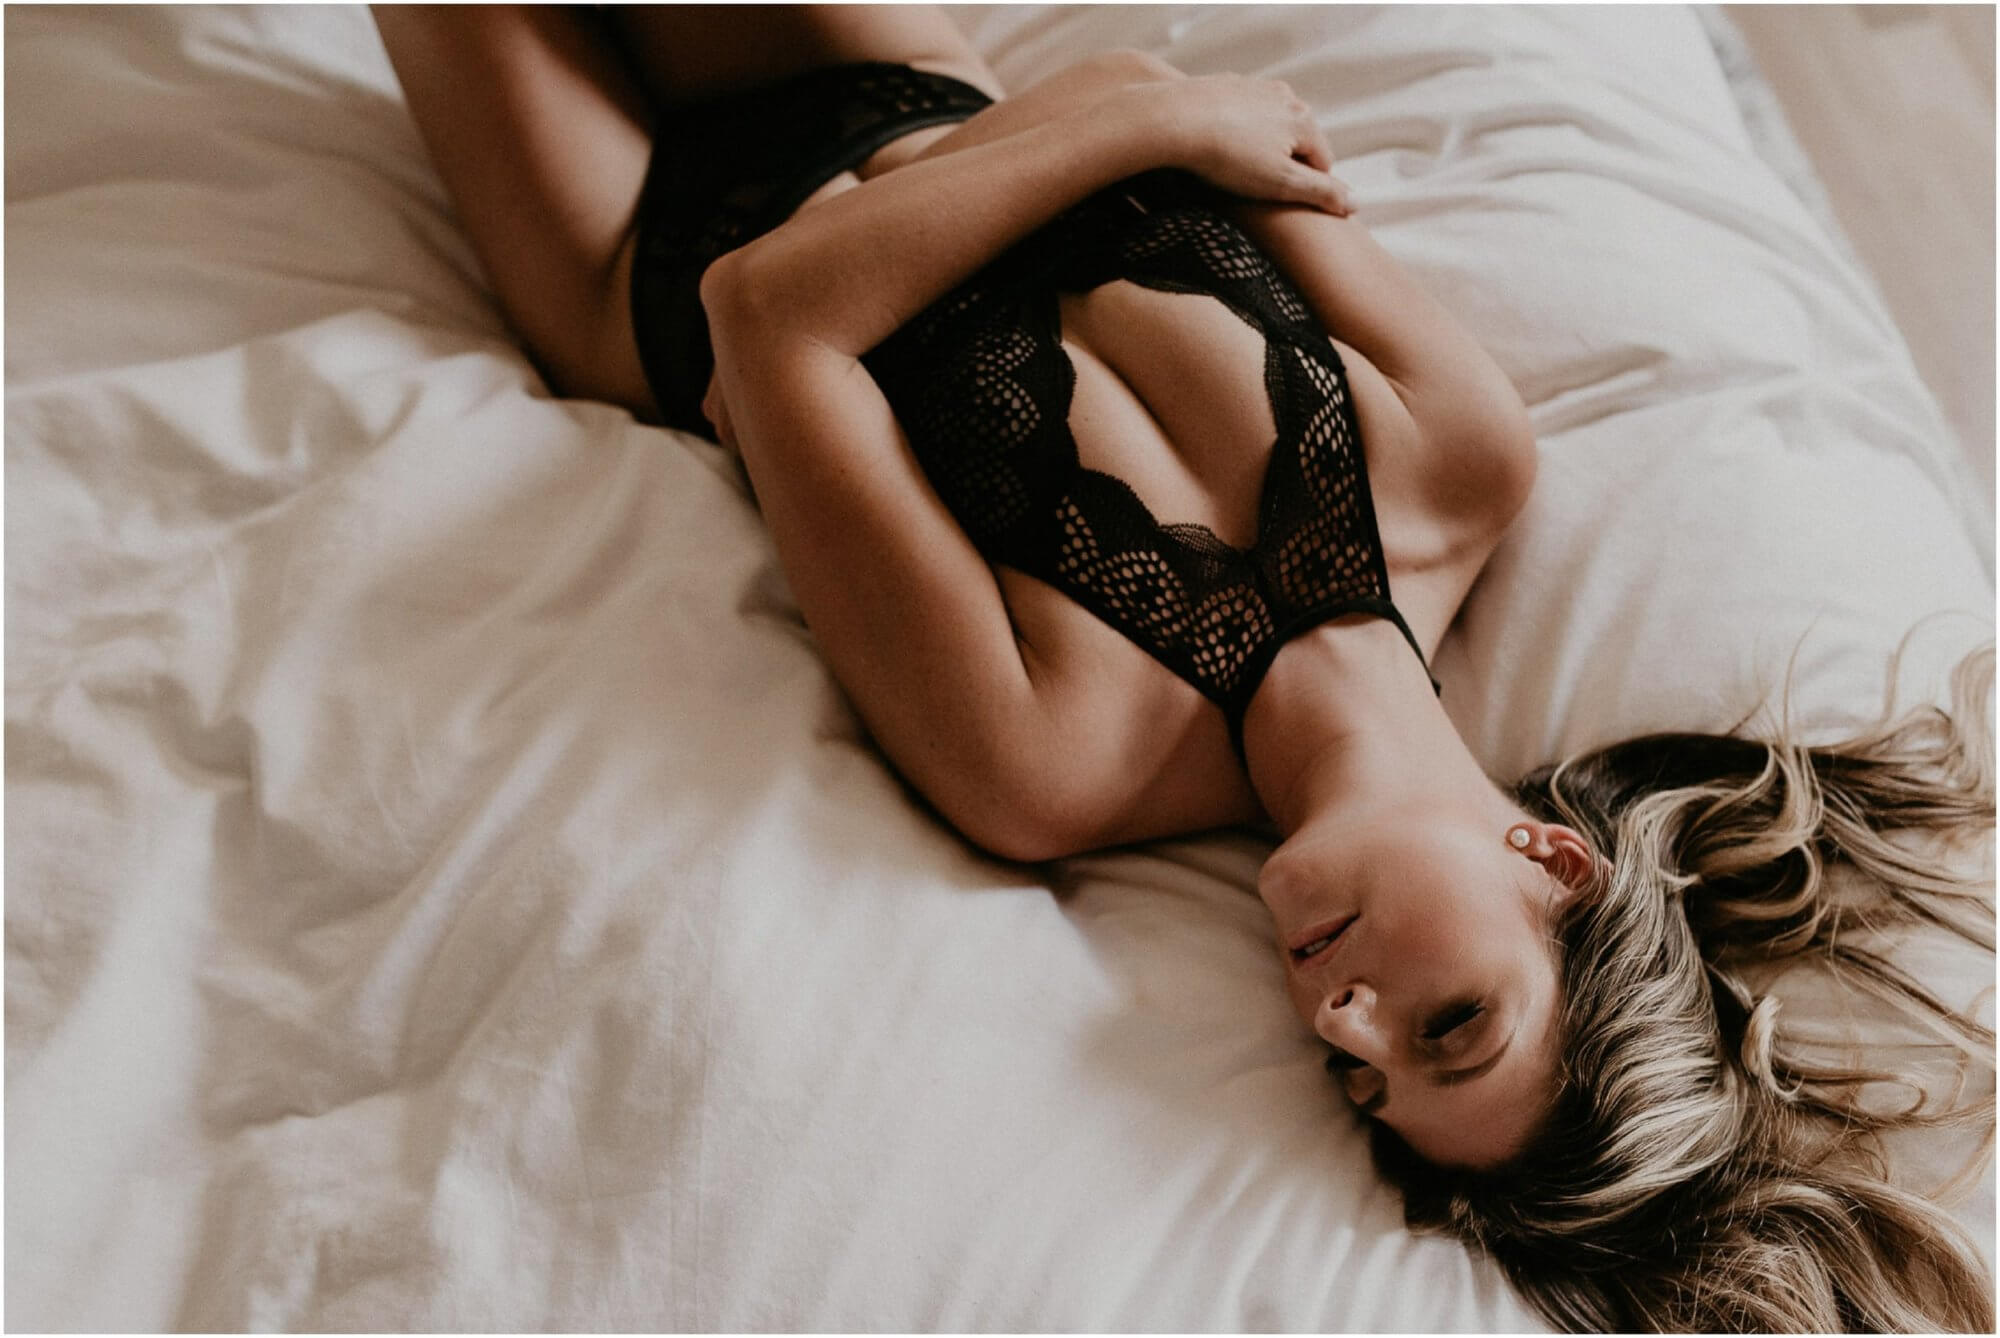 Sex i penetracja – na czym polega różnica